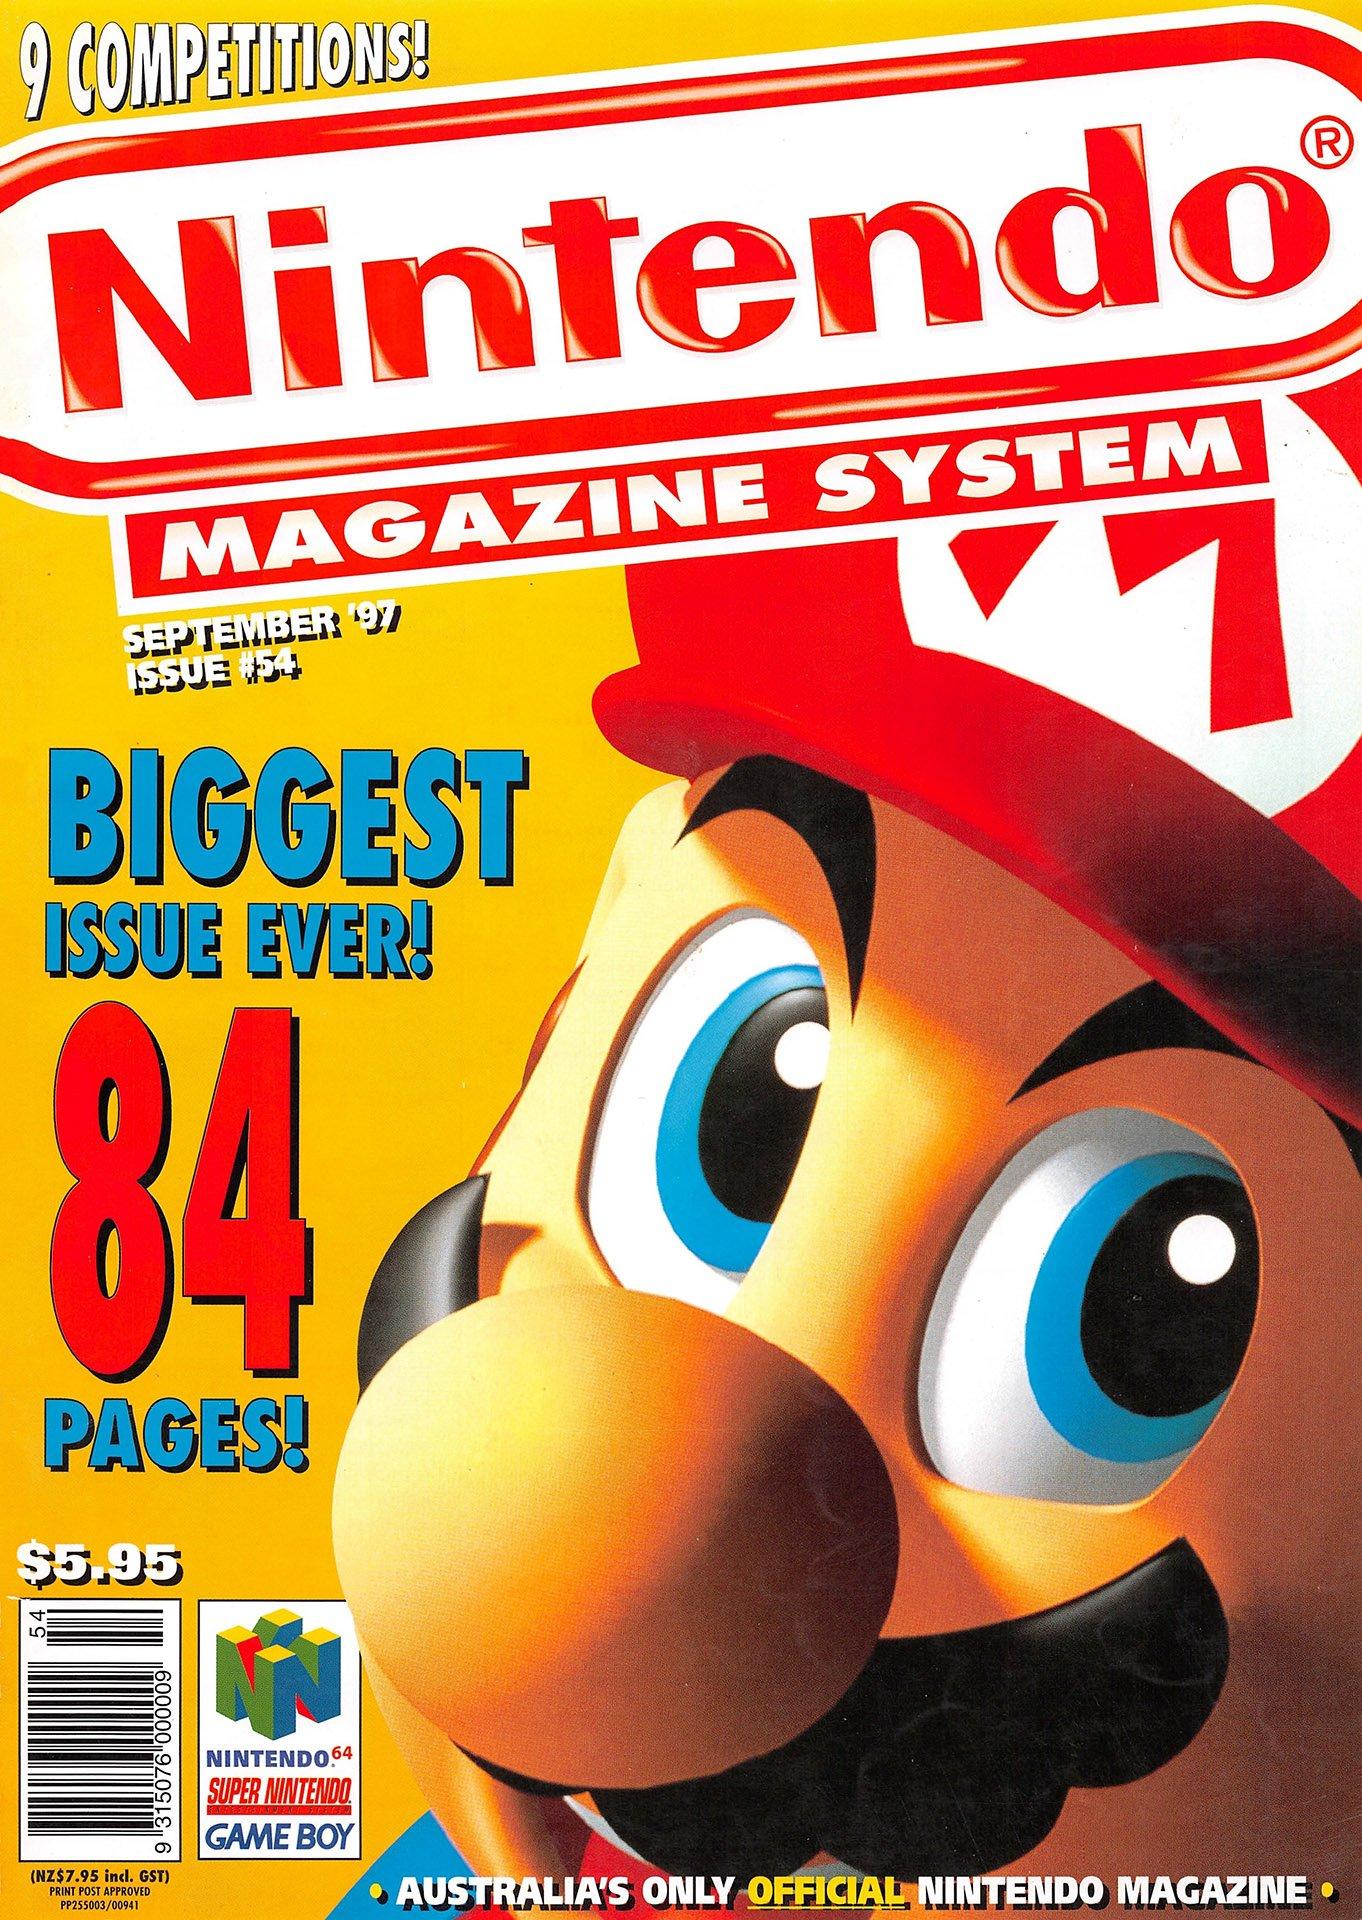 Nintendo Magazine System (AUS) 054 (September 1997)